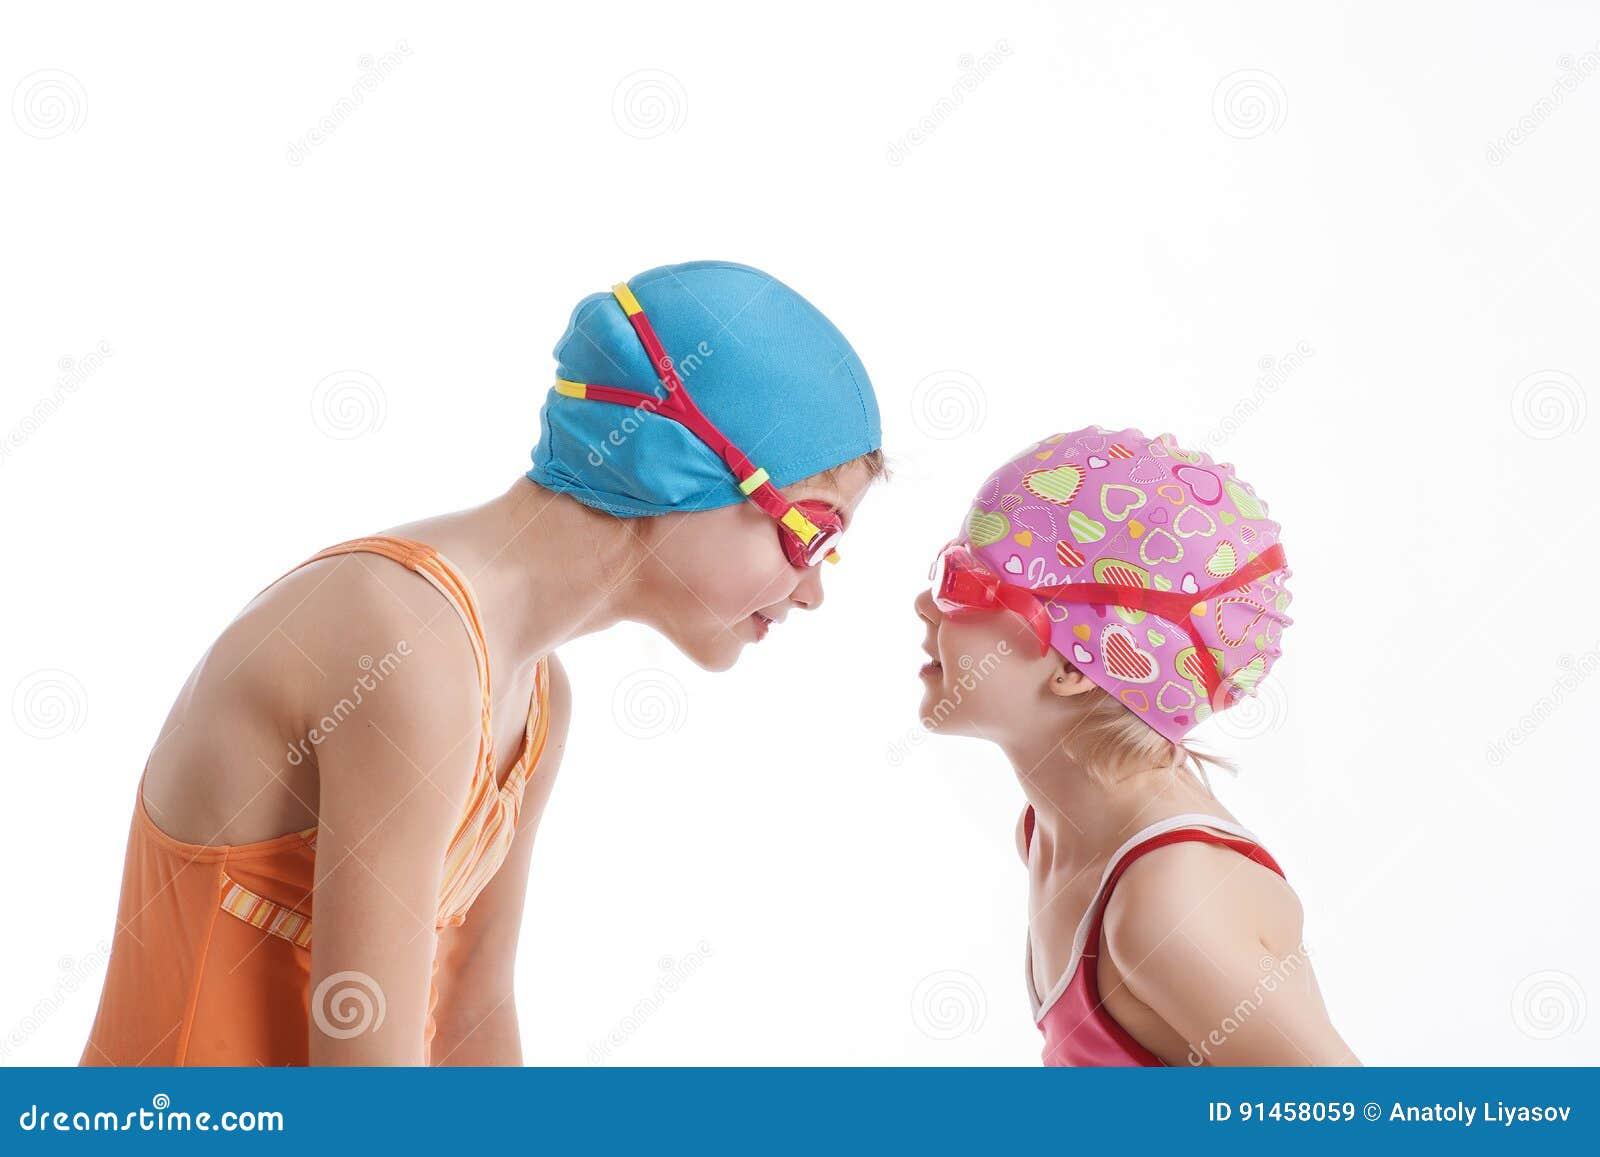 Girls Bathing Each Other